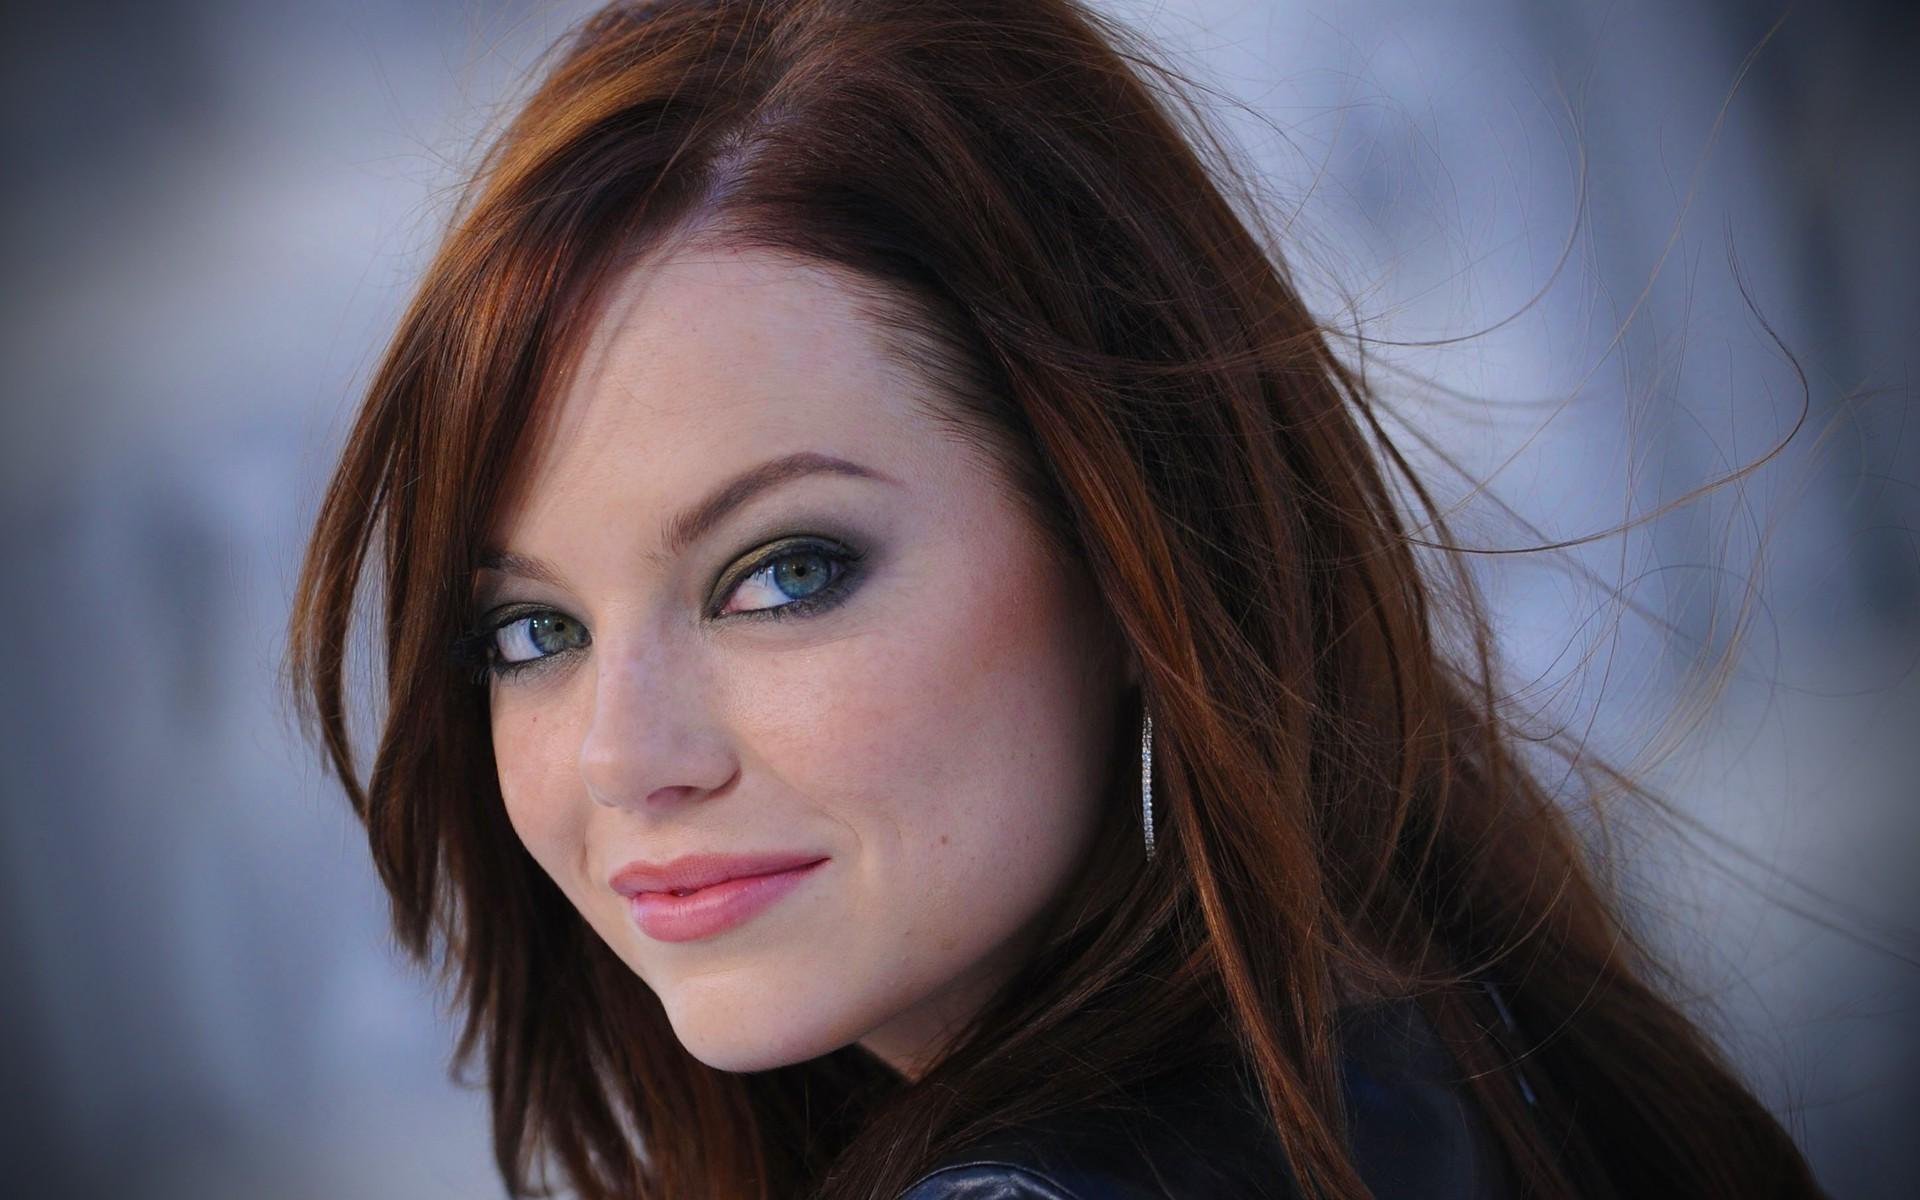 #EmmaStone | 4.30.14 | www.beautyvirtualdistributor.com | BVD | Trending  Today | Pinterest | Emma stone, Beautiful people and Famous people